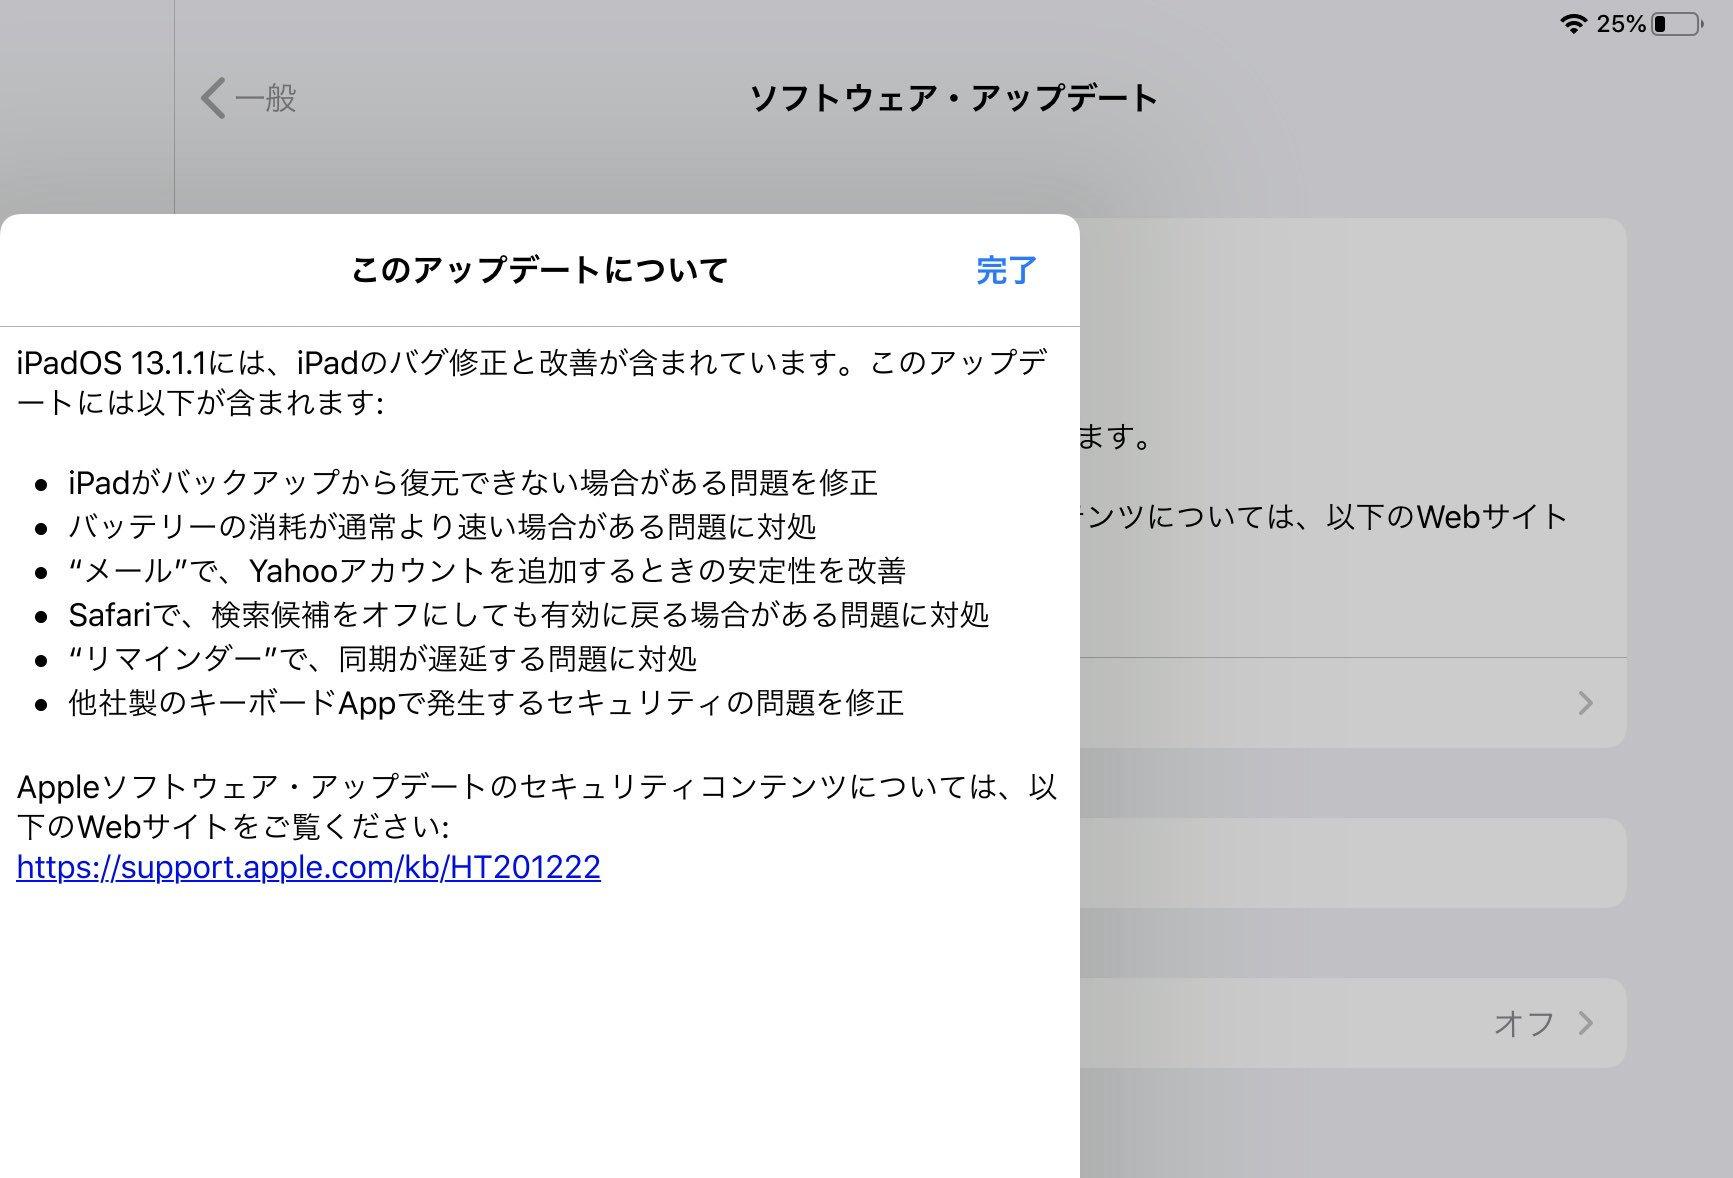 iPadOS 13.1.1 がキタ━━━(゚∀゚)━━━!! https://t.co/B9qskemGAT